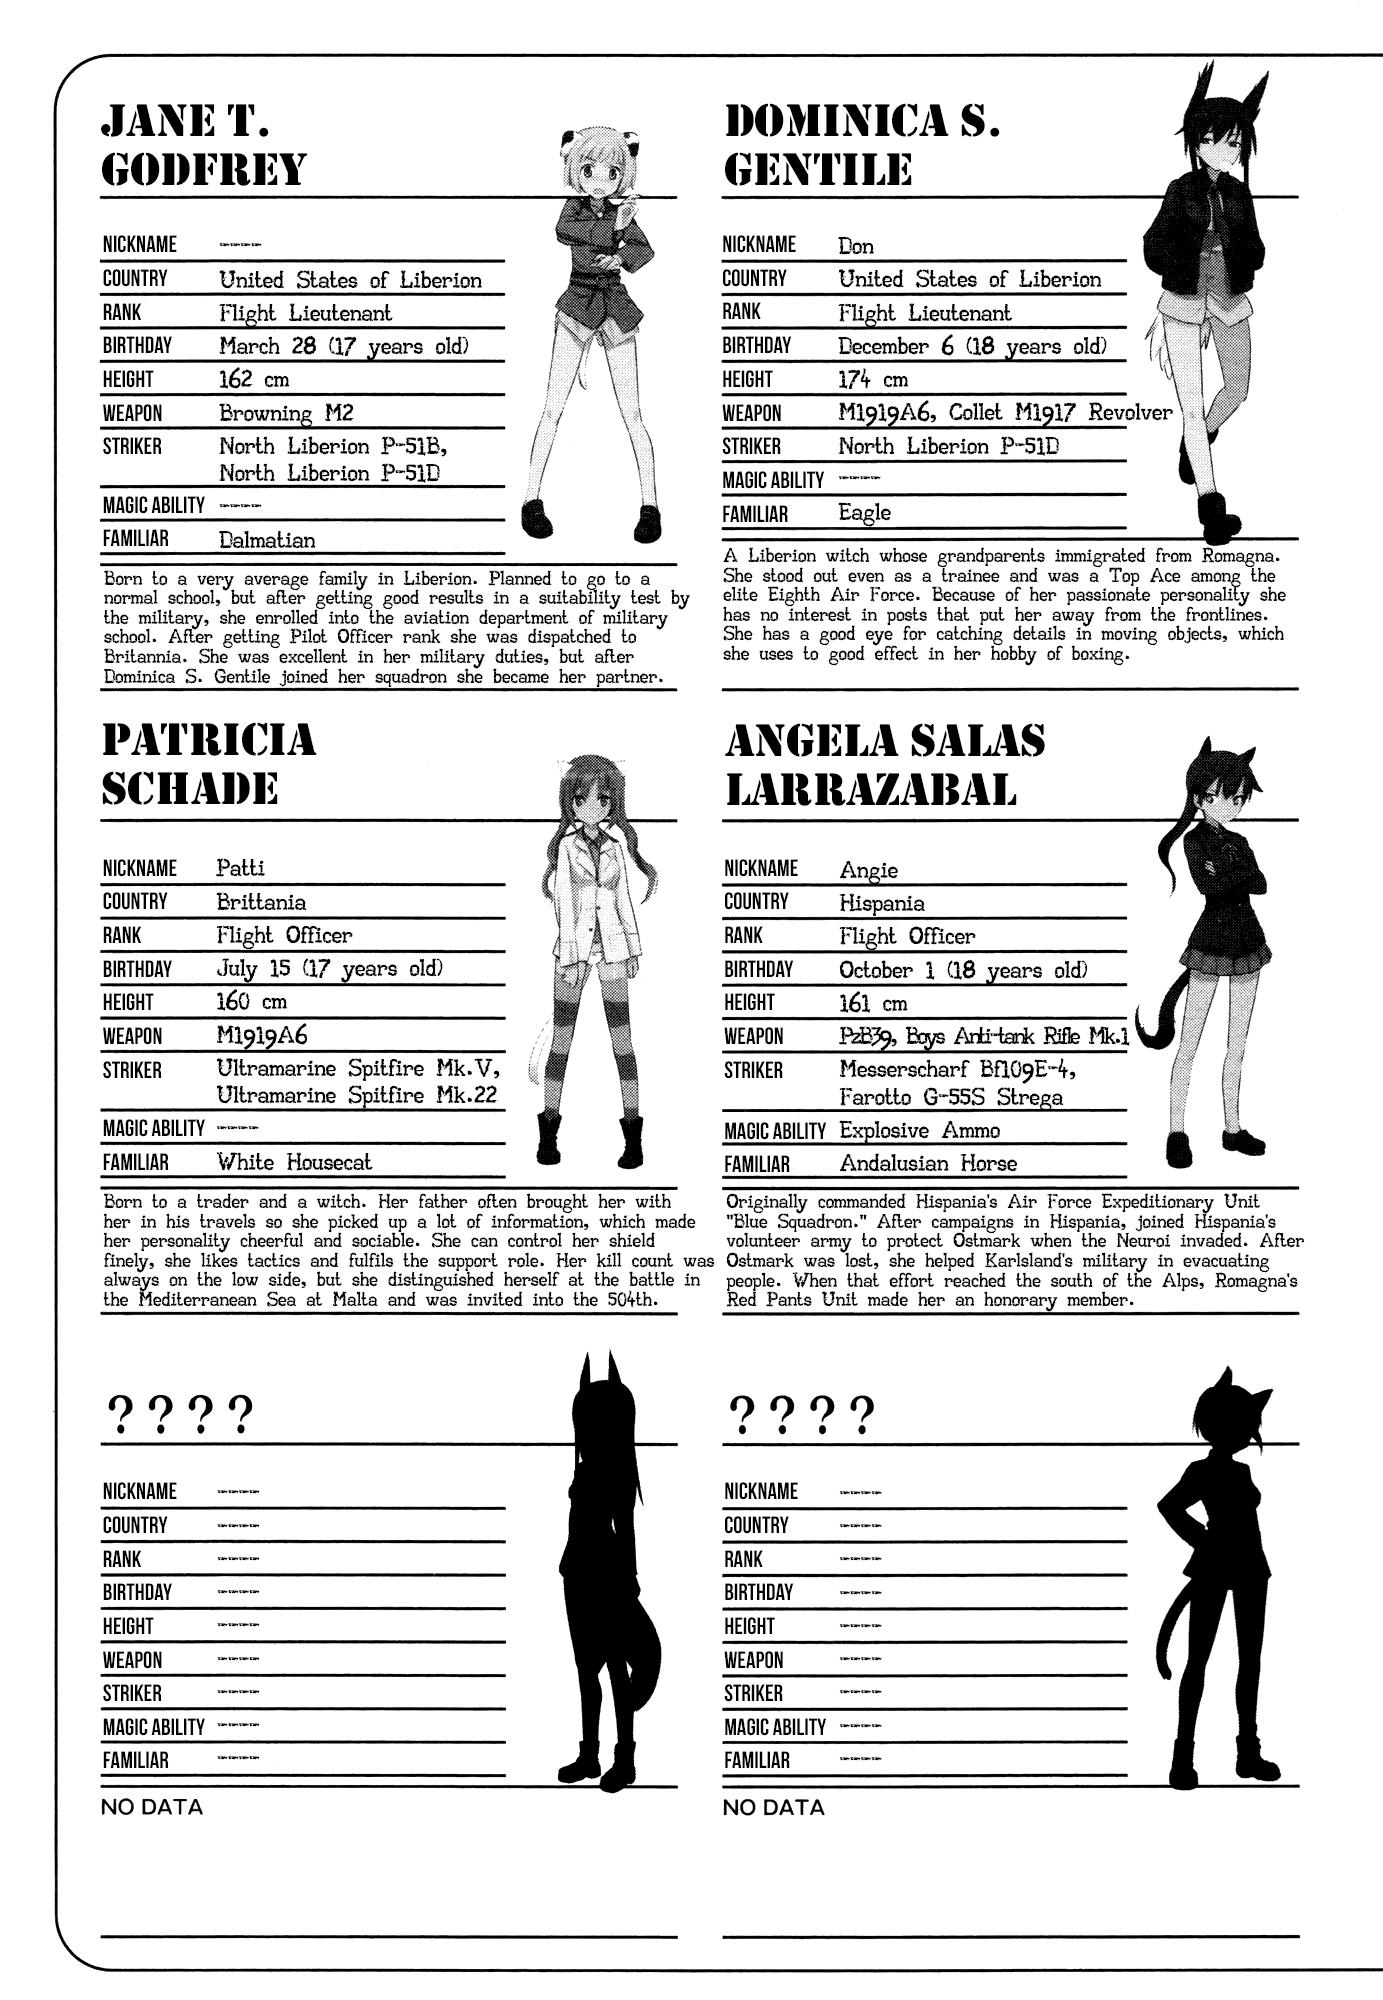 Strike Witches - Kurenai no Majotachi Vol 1 Ch 6: The Twos New Post (Last Part)